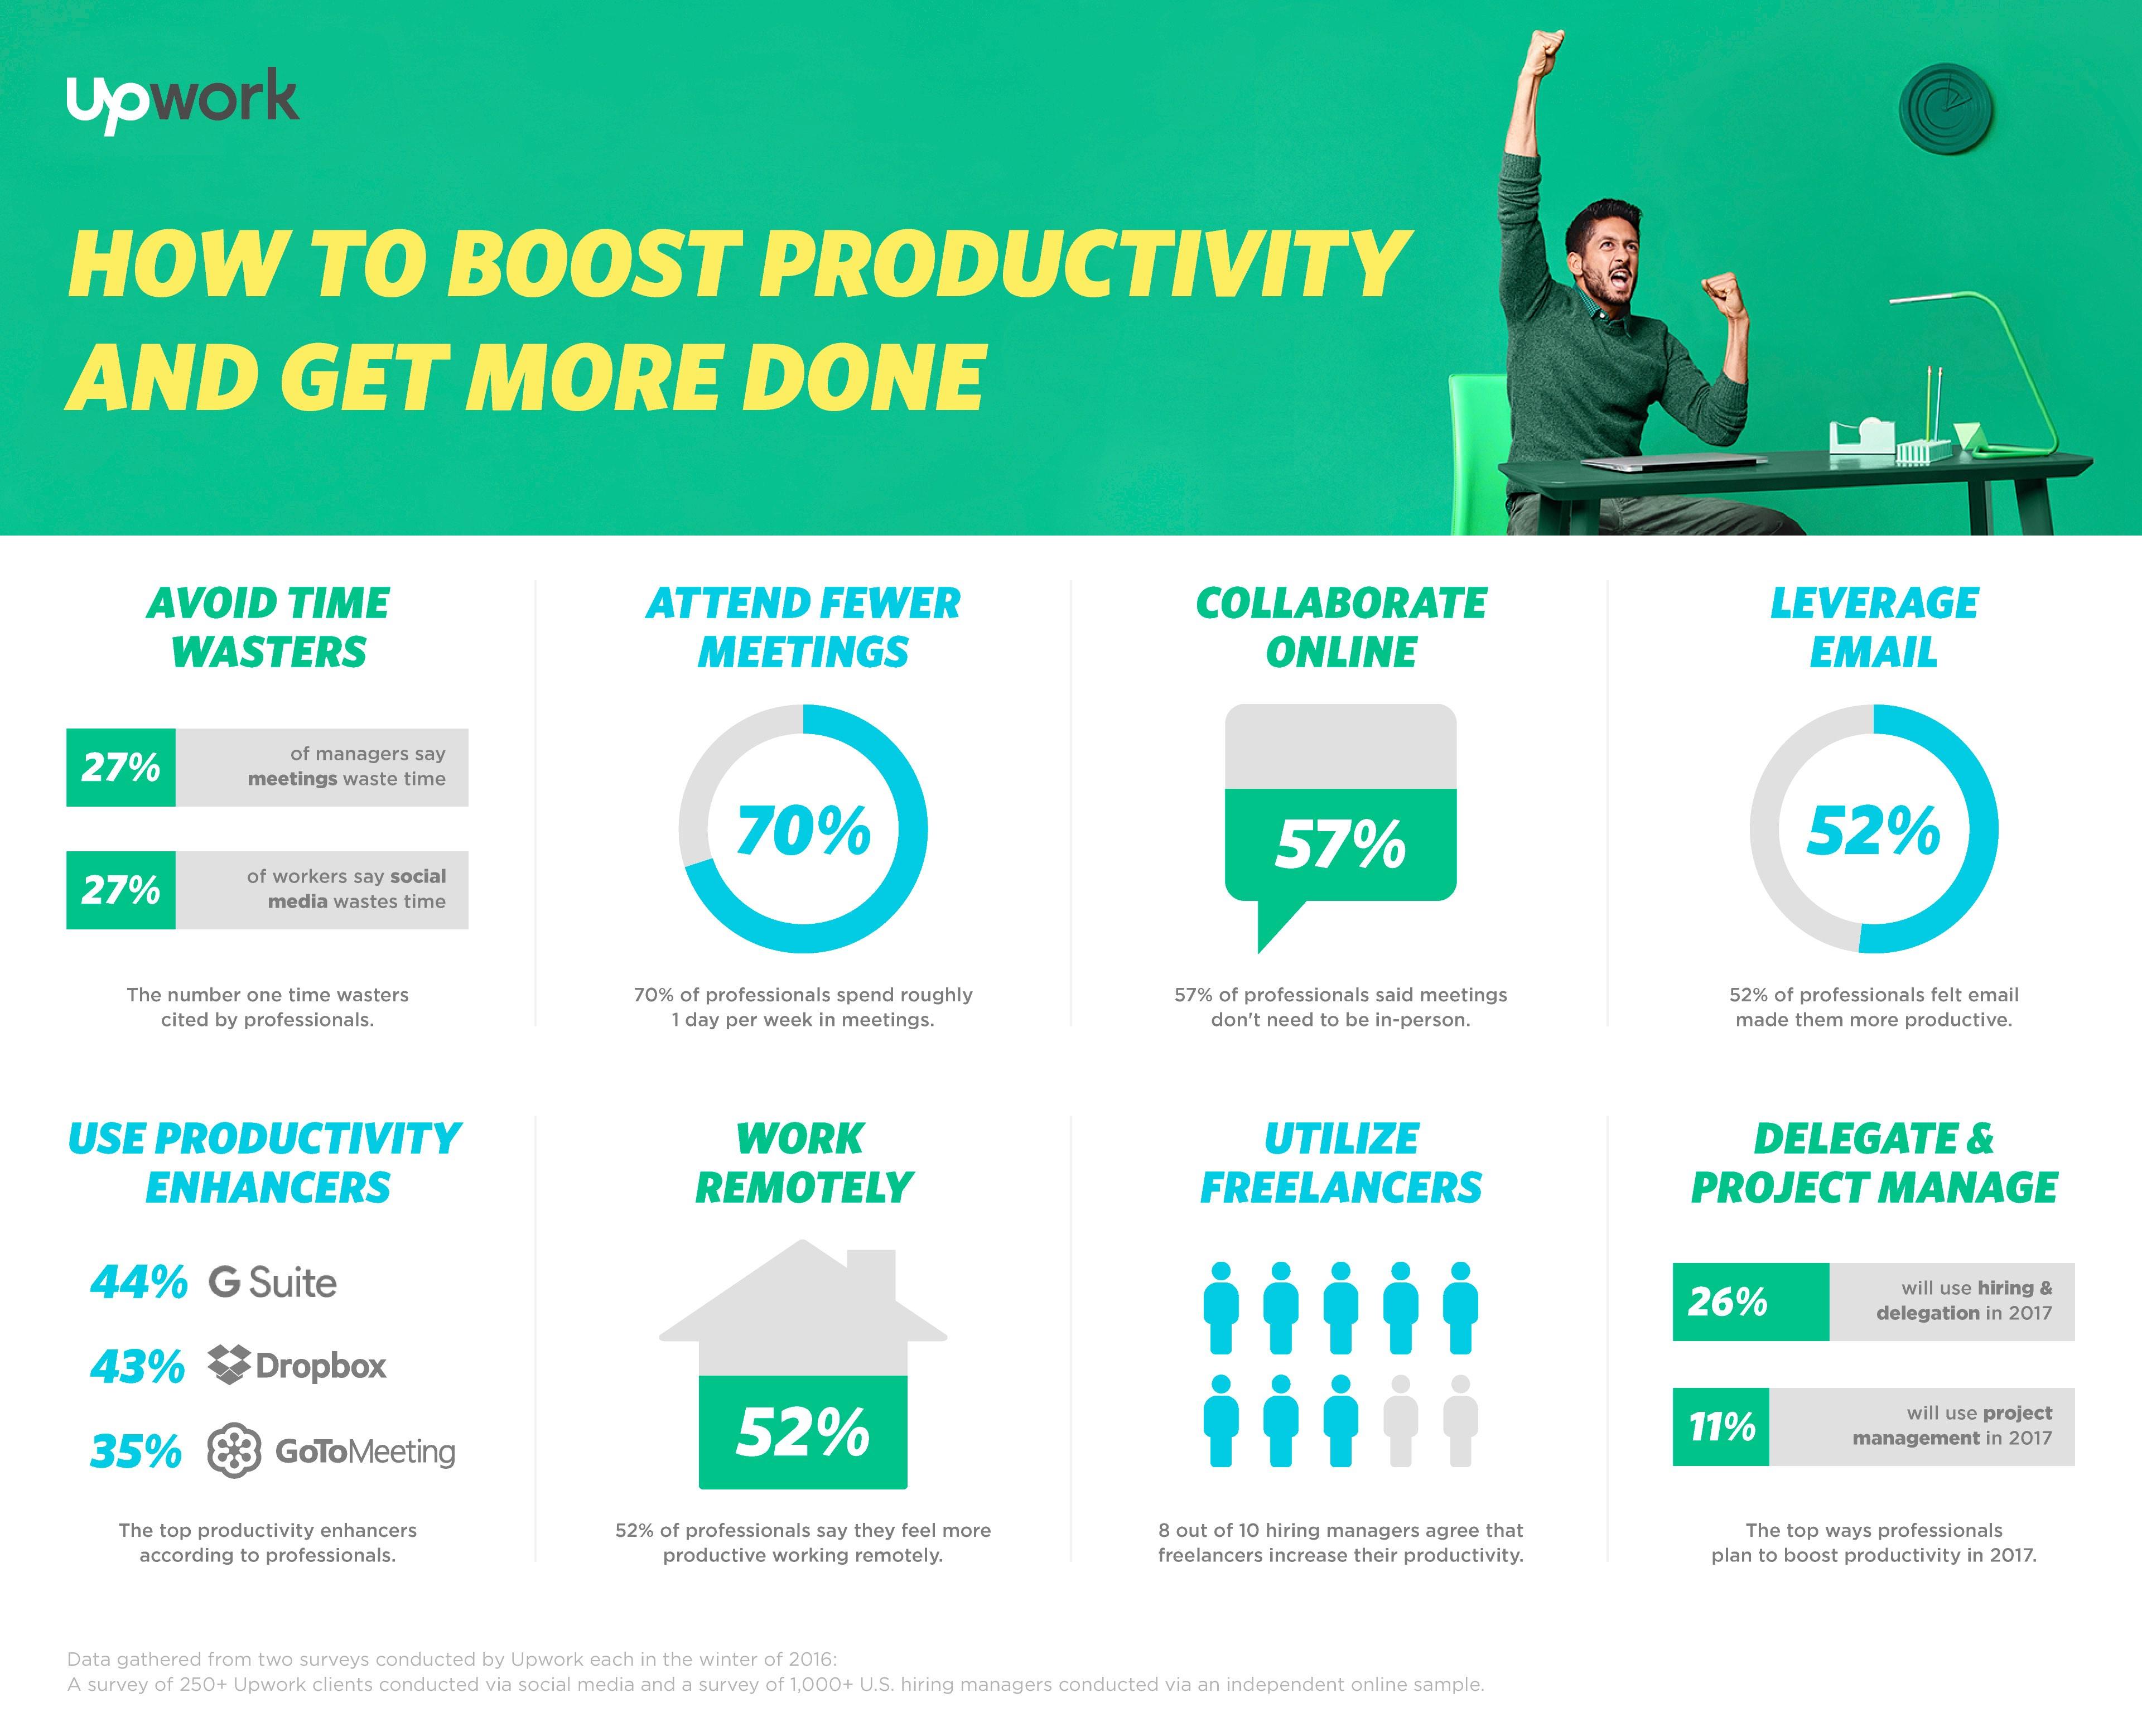 Productivity-IG copy 2.jpg